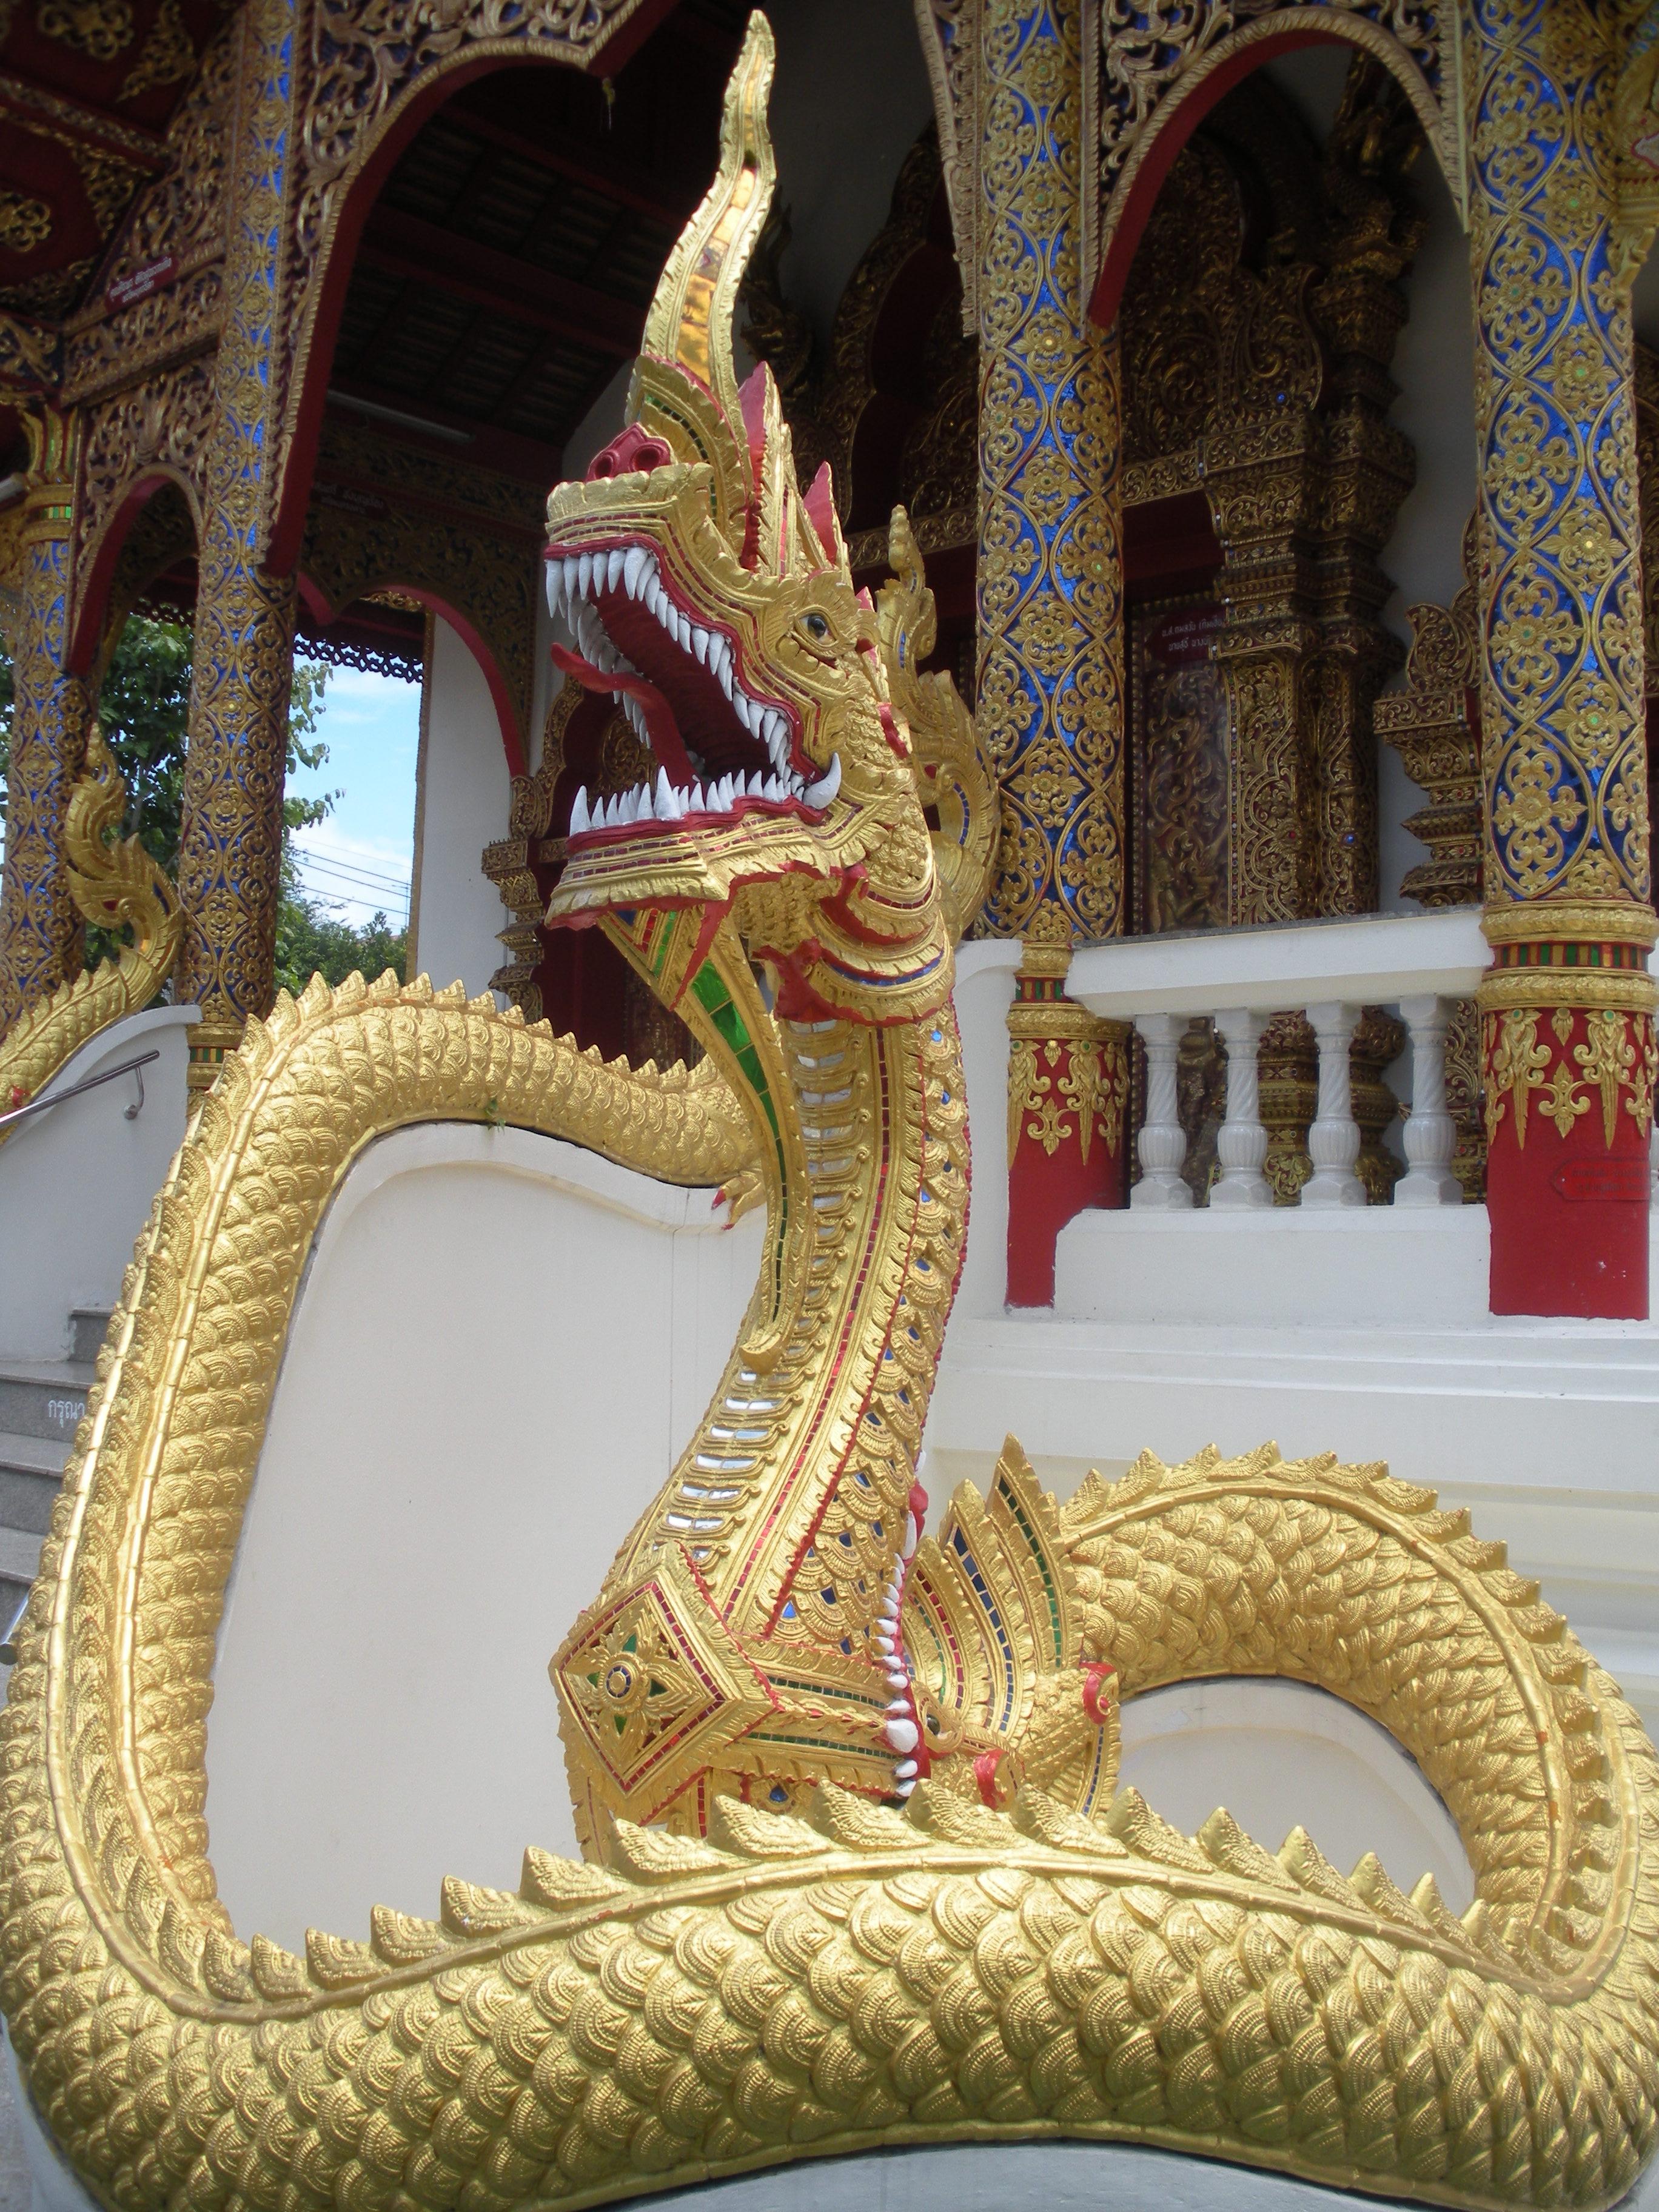 a golden naga, or serpent, guarding a temple